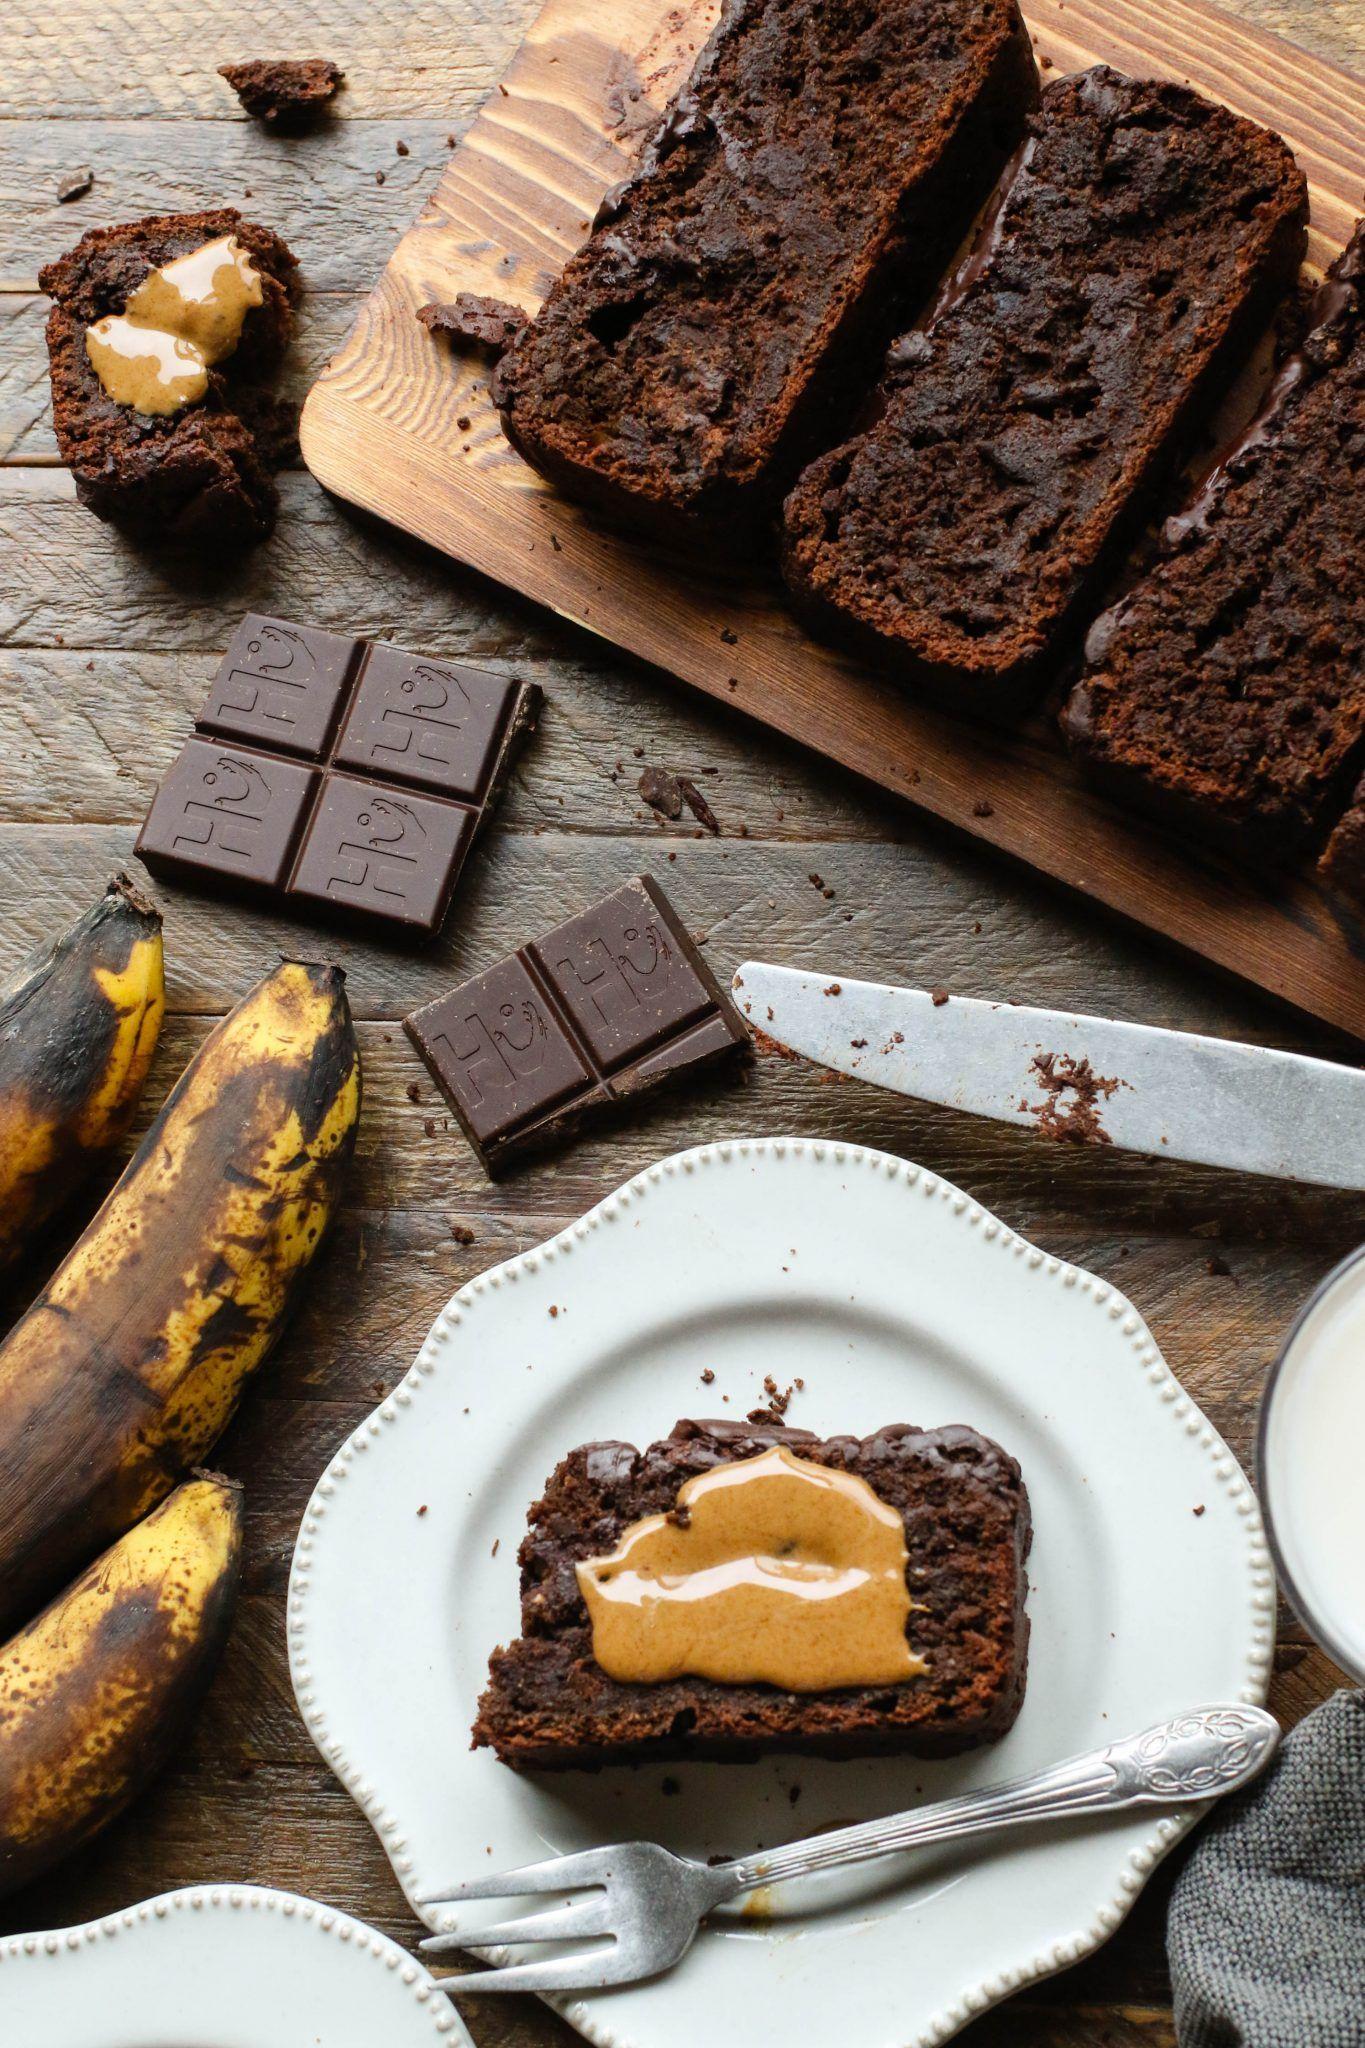 Double Chocolate Banana Bread Flora Vino Recipe In 2020 Chocolate Banana Bread Vegan Baking Recipes Chocolate Banana